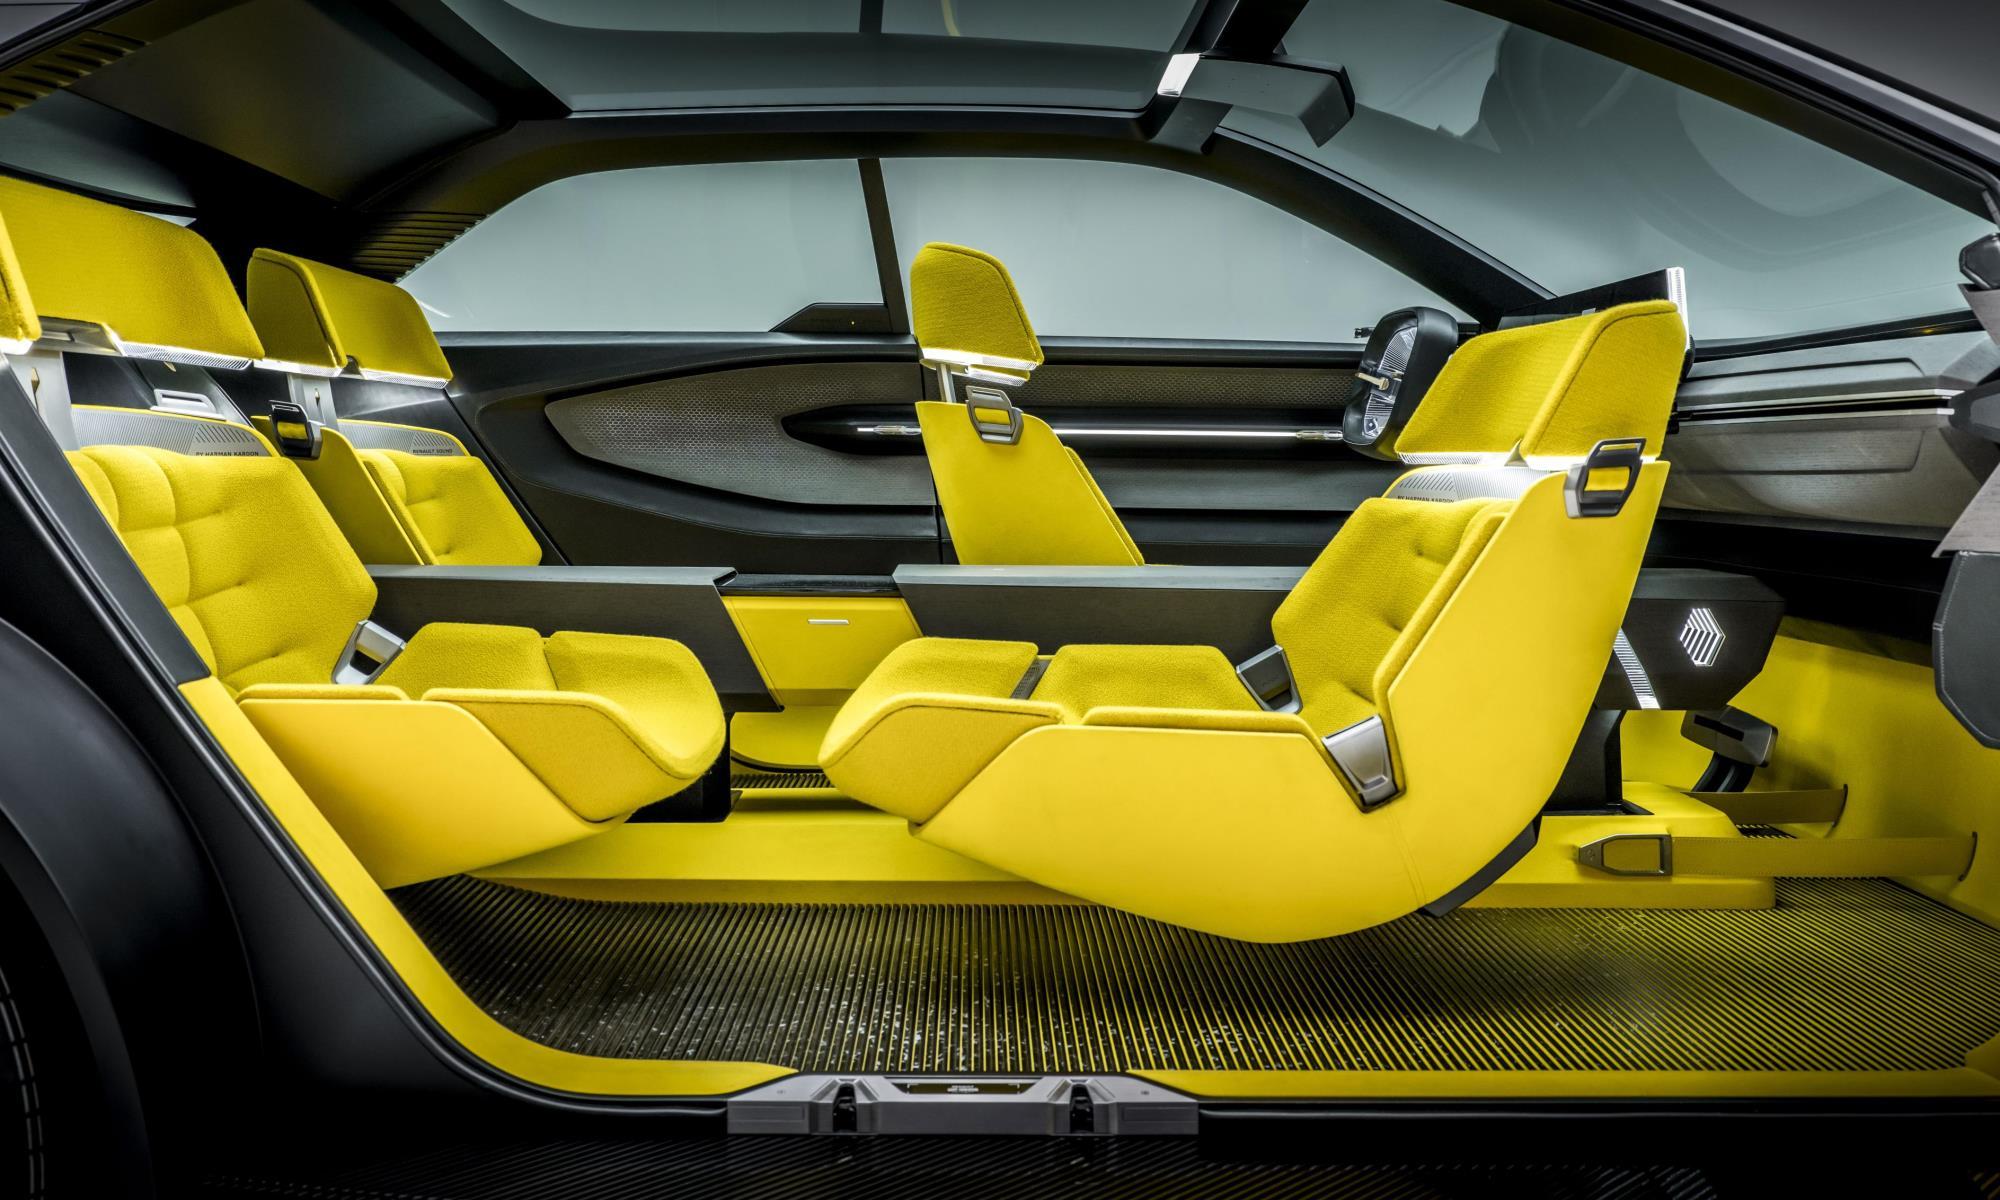 Renault Morphoz Concept cabin